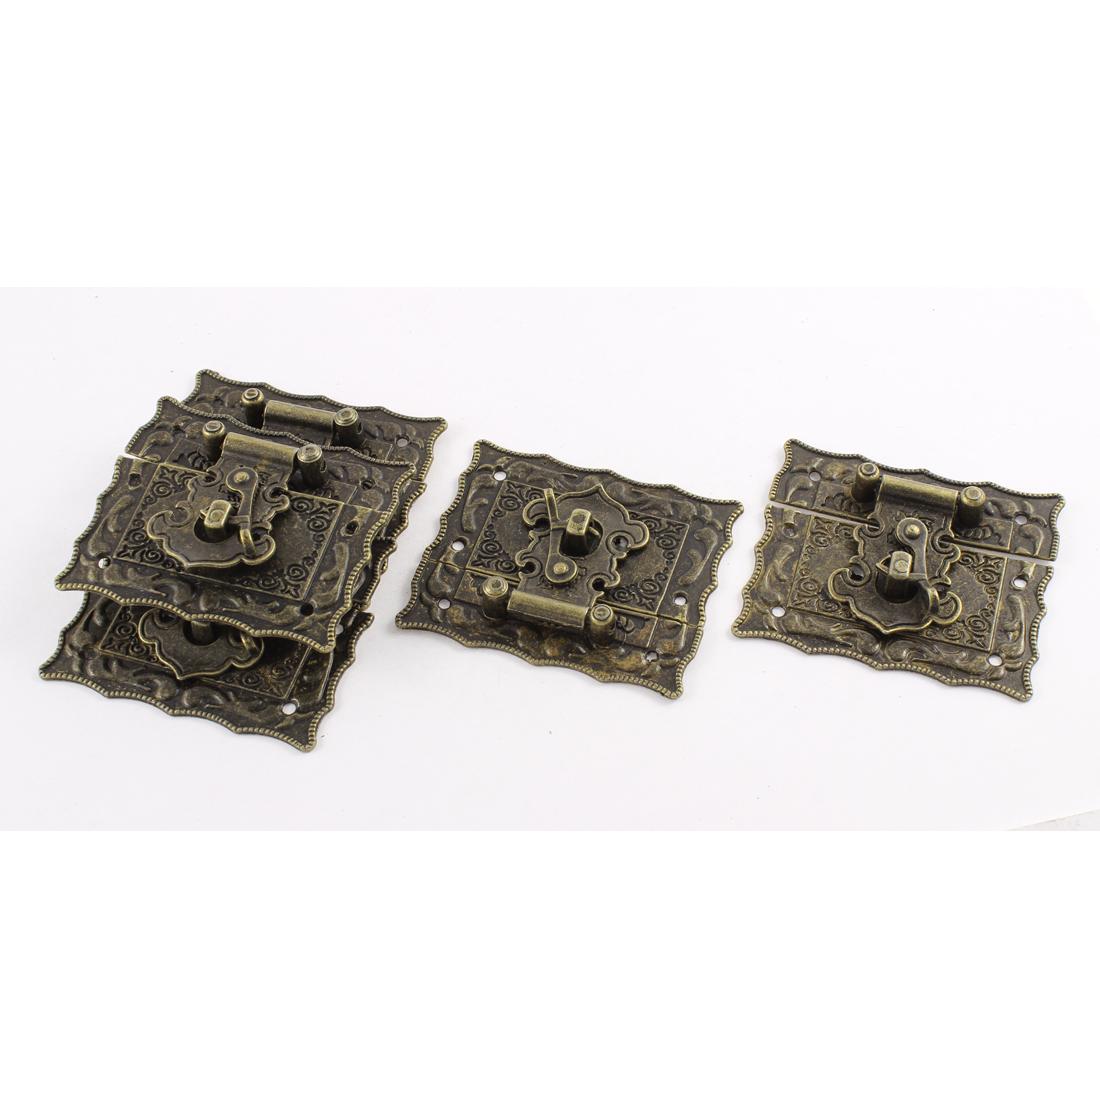 5pcs 67mmx56mm Vintage Style Jewelry Box Hasp Latch Lock w Screws